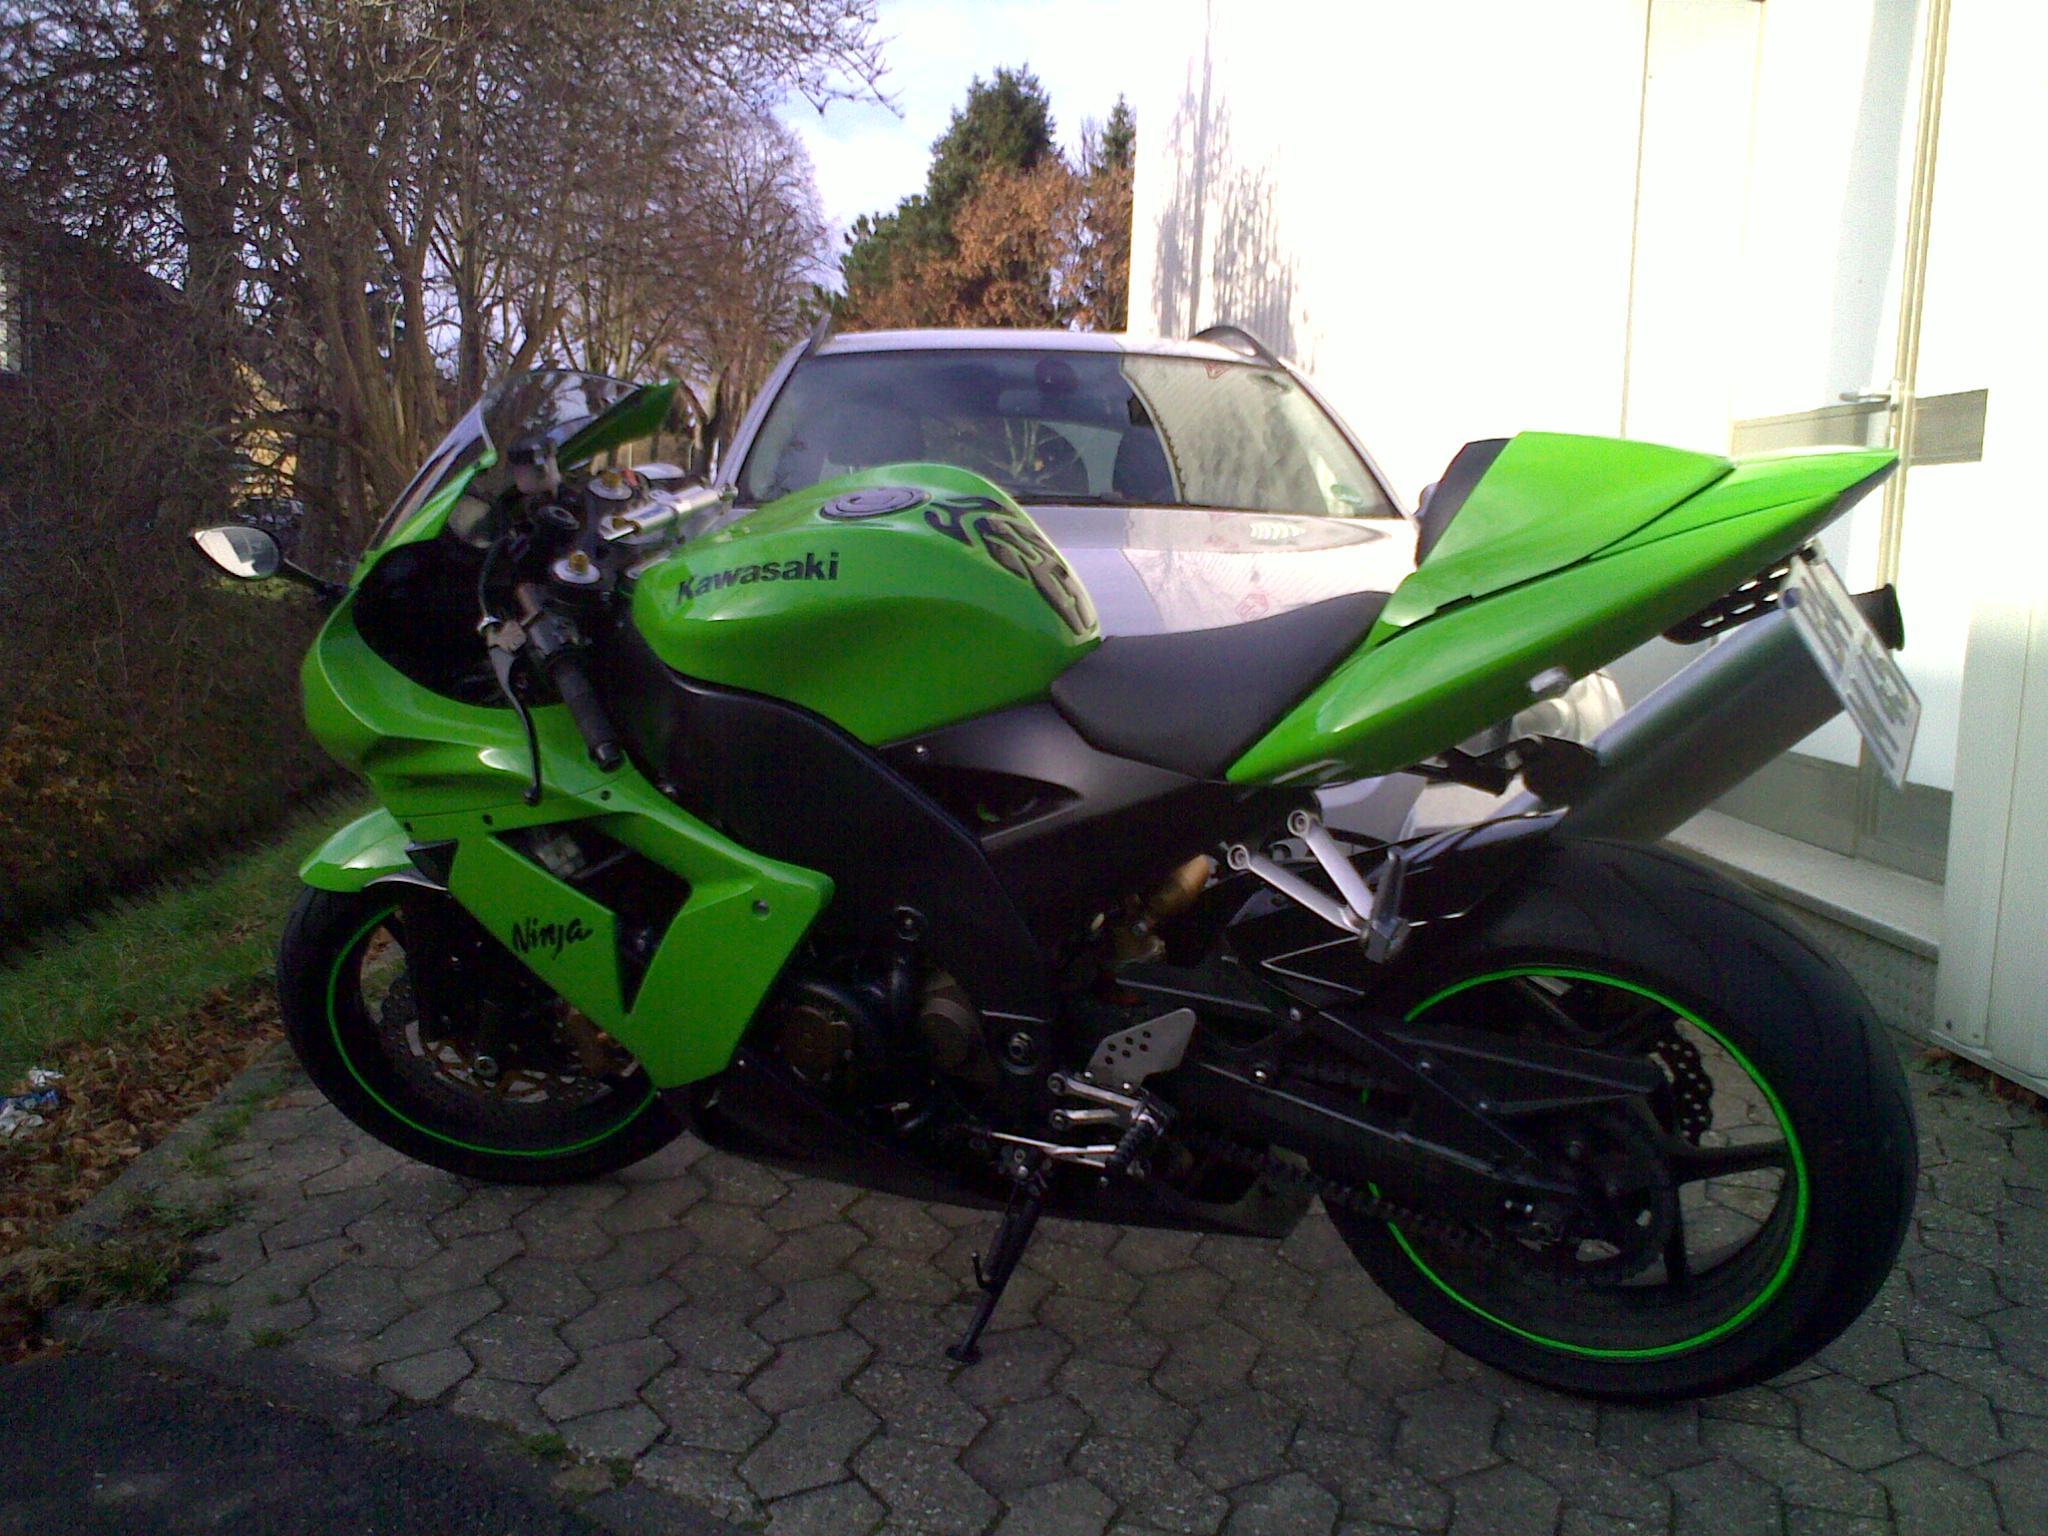 Kawasaki Ninja Zx10r Gegen Yamaha Yzf-r6 - Andere Bikes und Marken ...